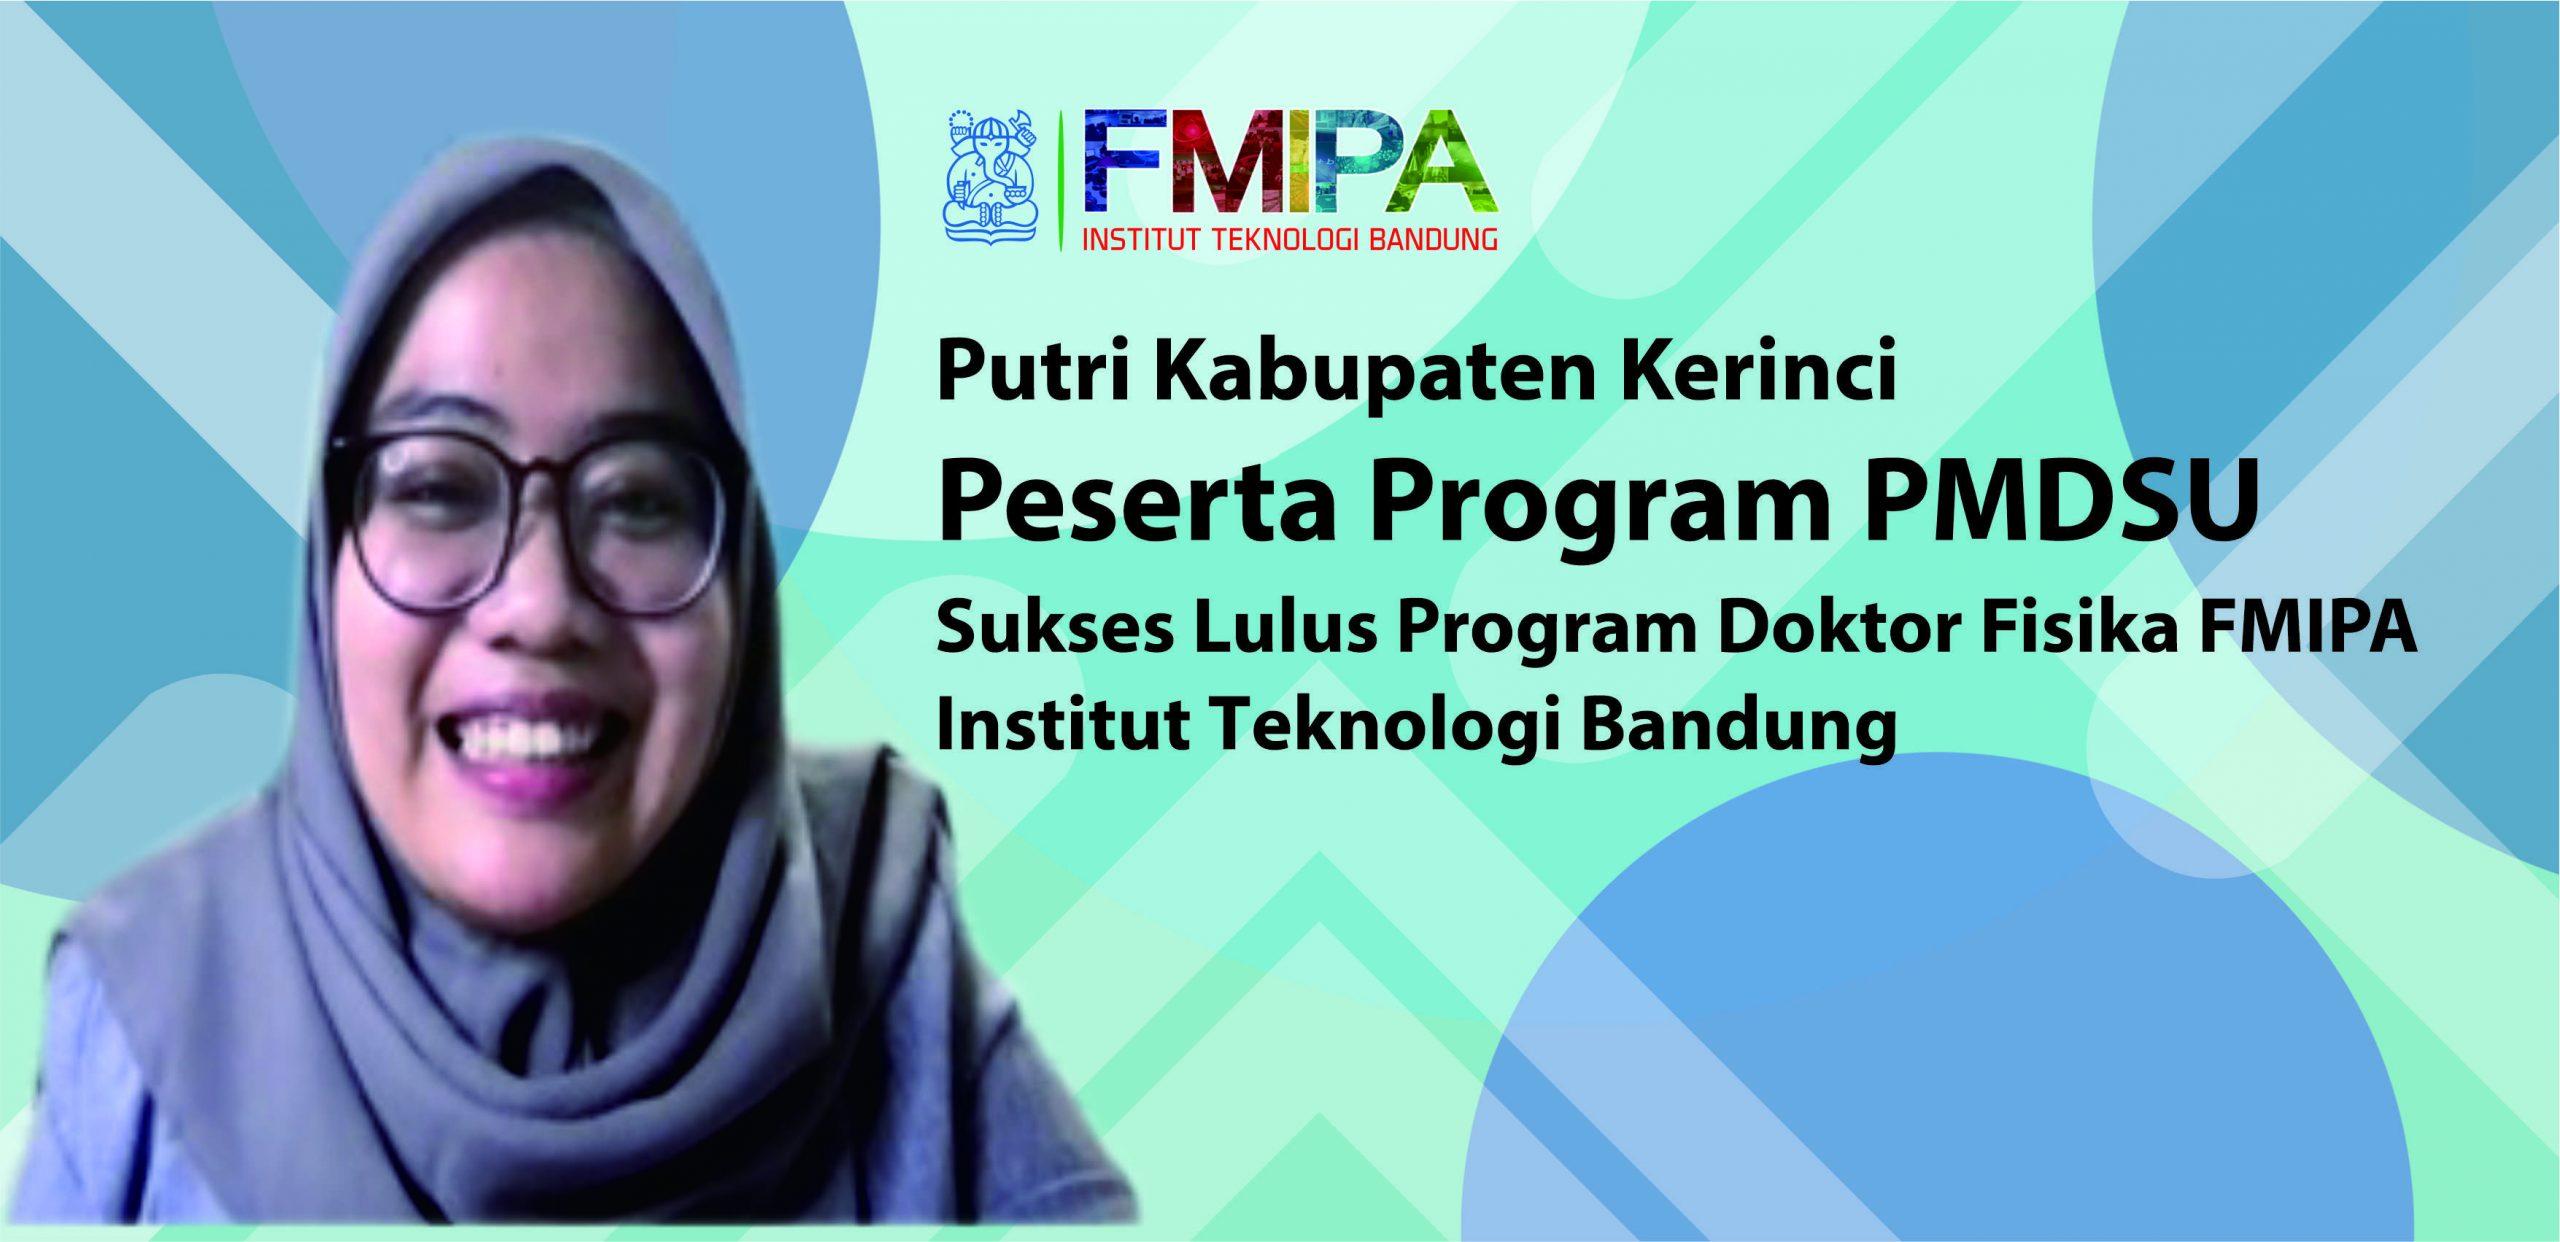 Peserta Program PMDSU Putri Kabupaten Kerinci Sukses Lulus Program Doktor Fisika FMIPA ITB